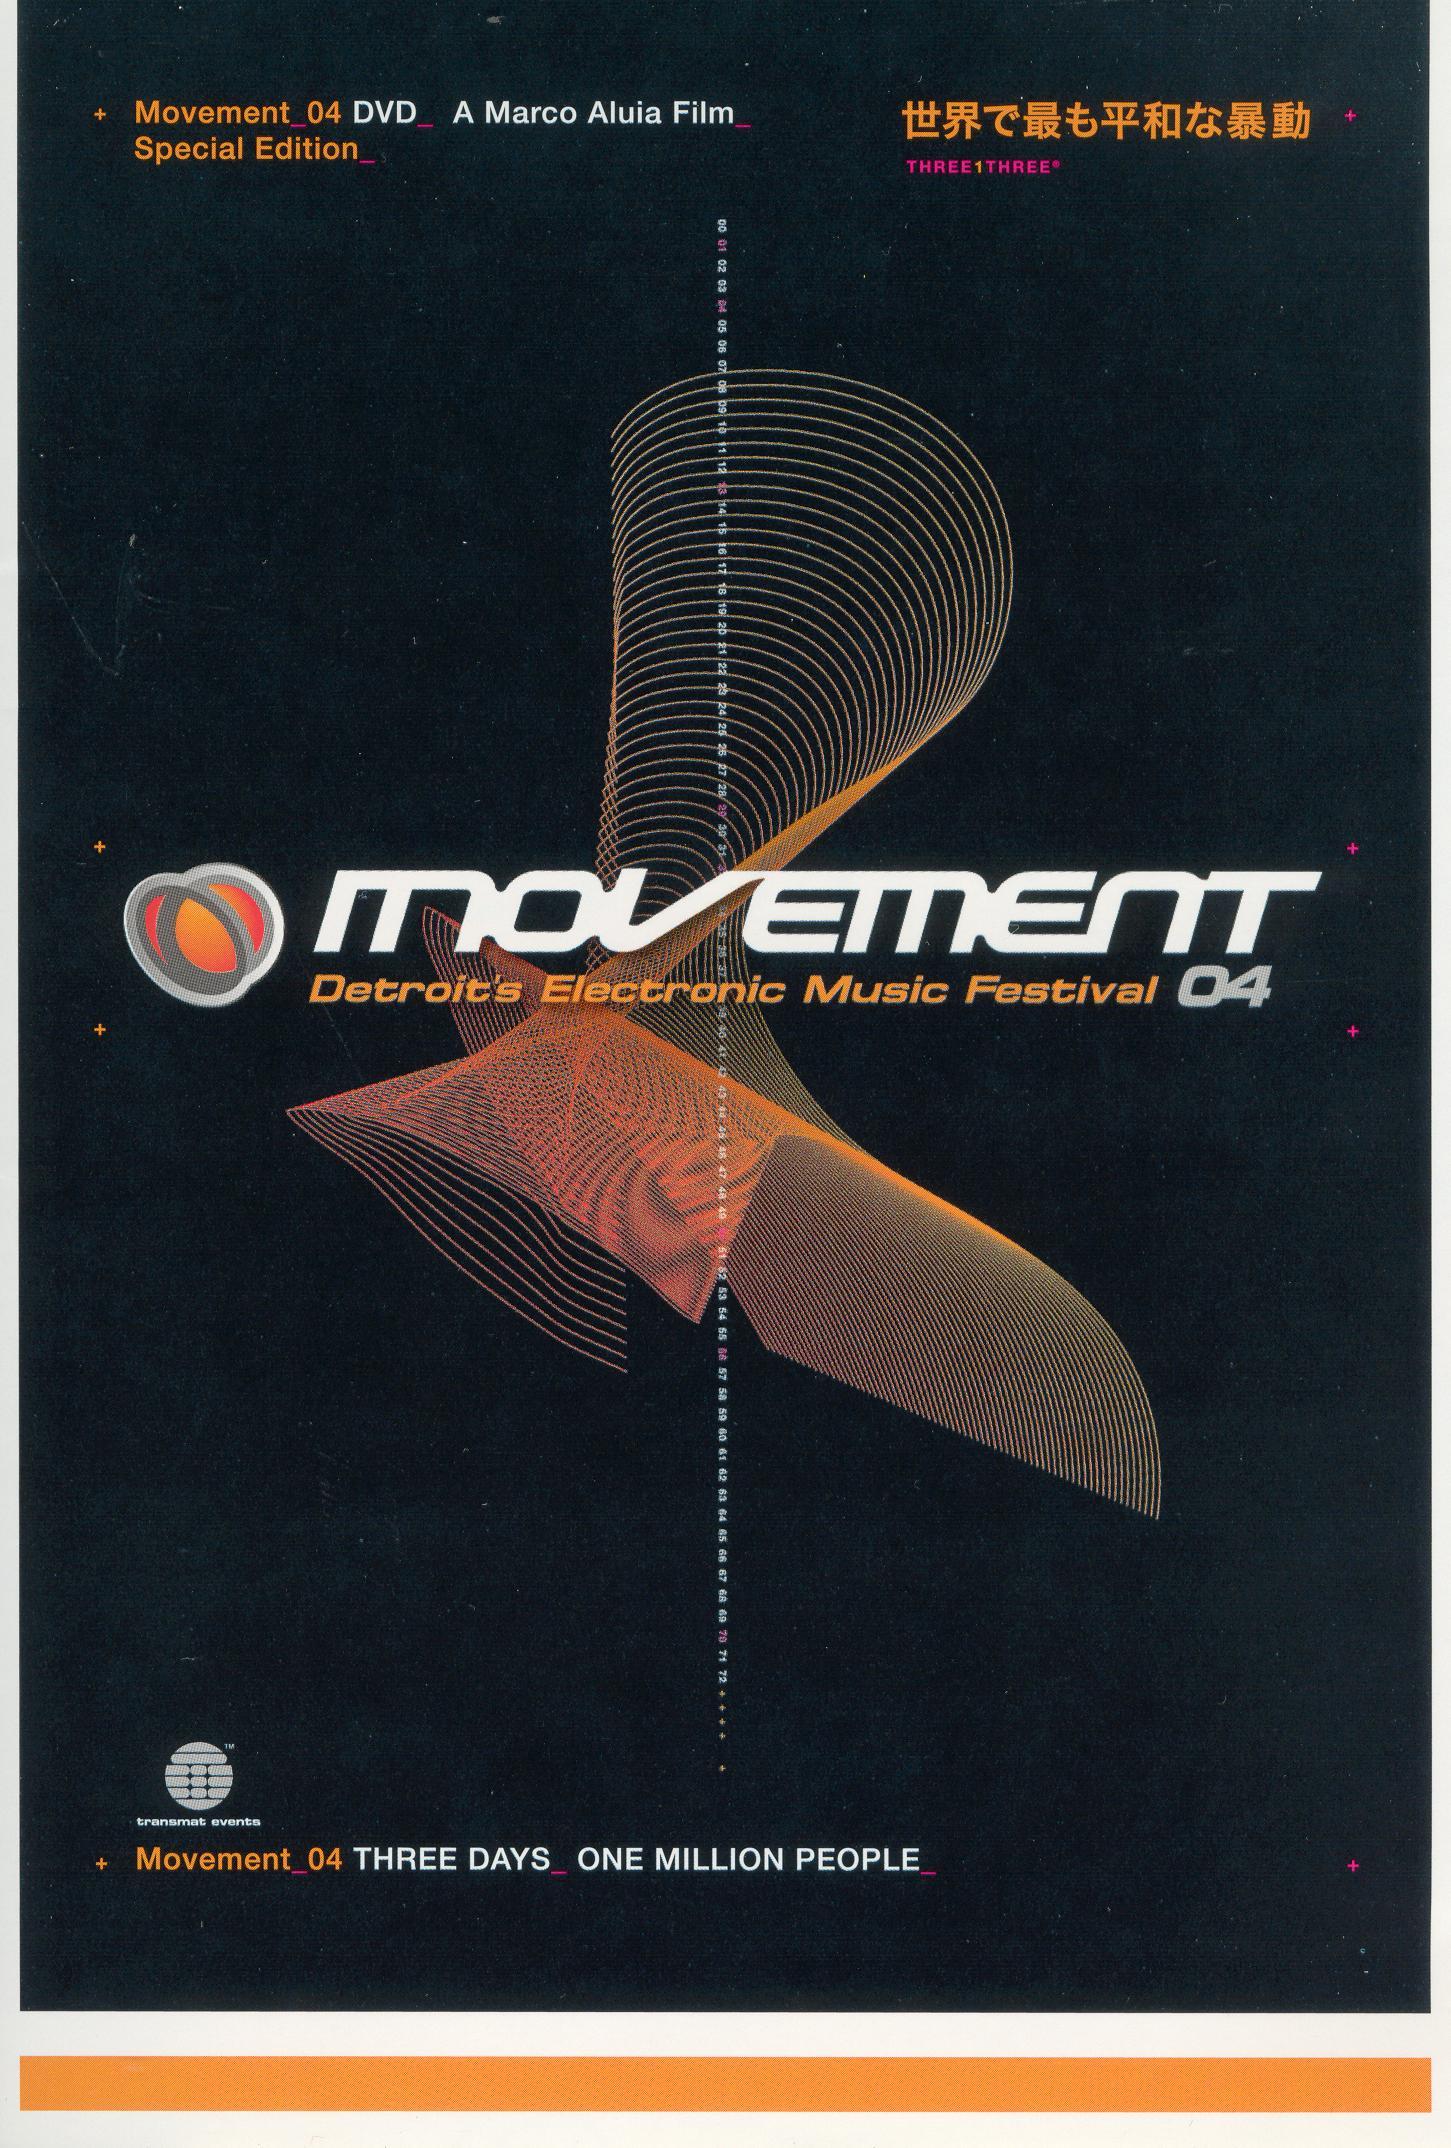 Movement: Detroit's Electronic Music Festival '04